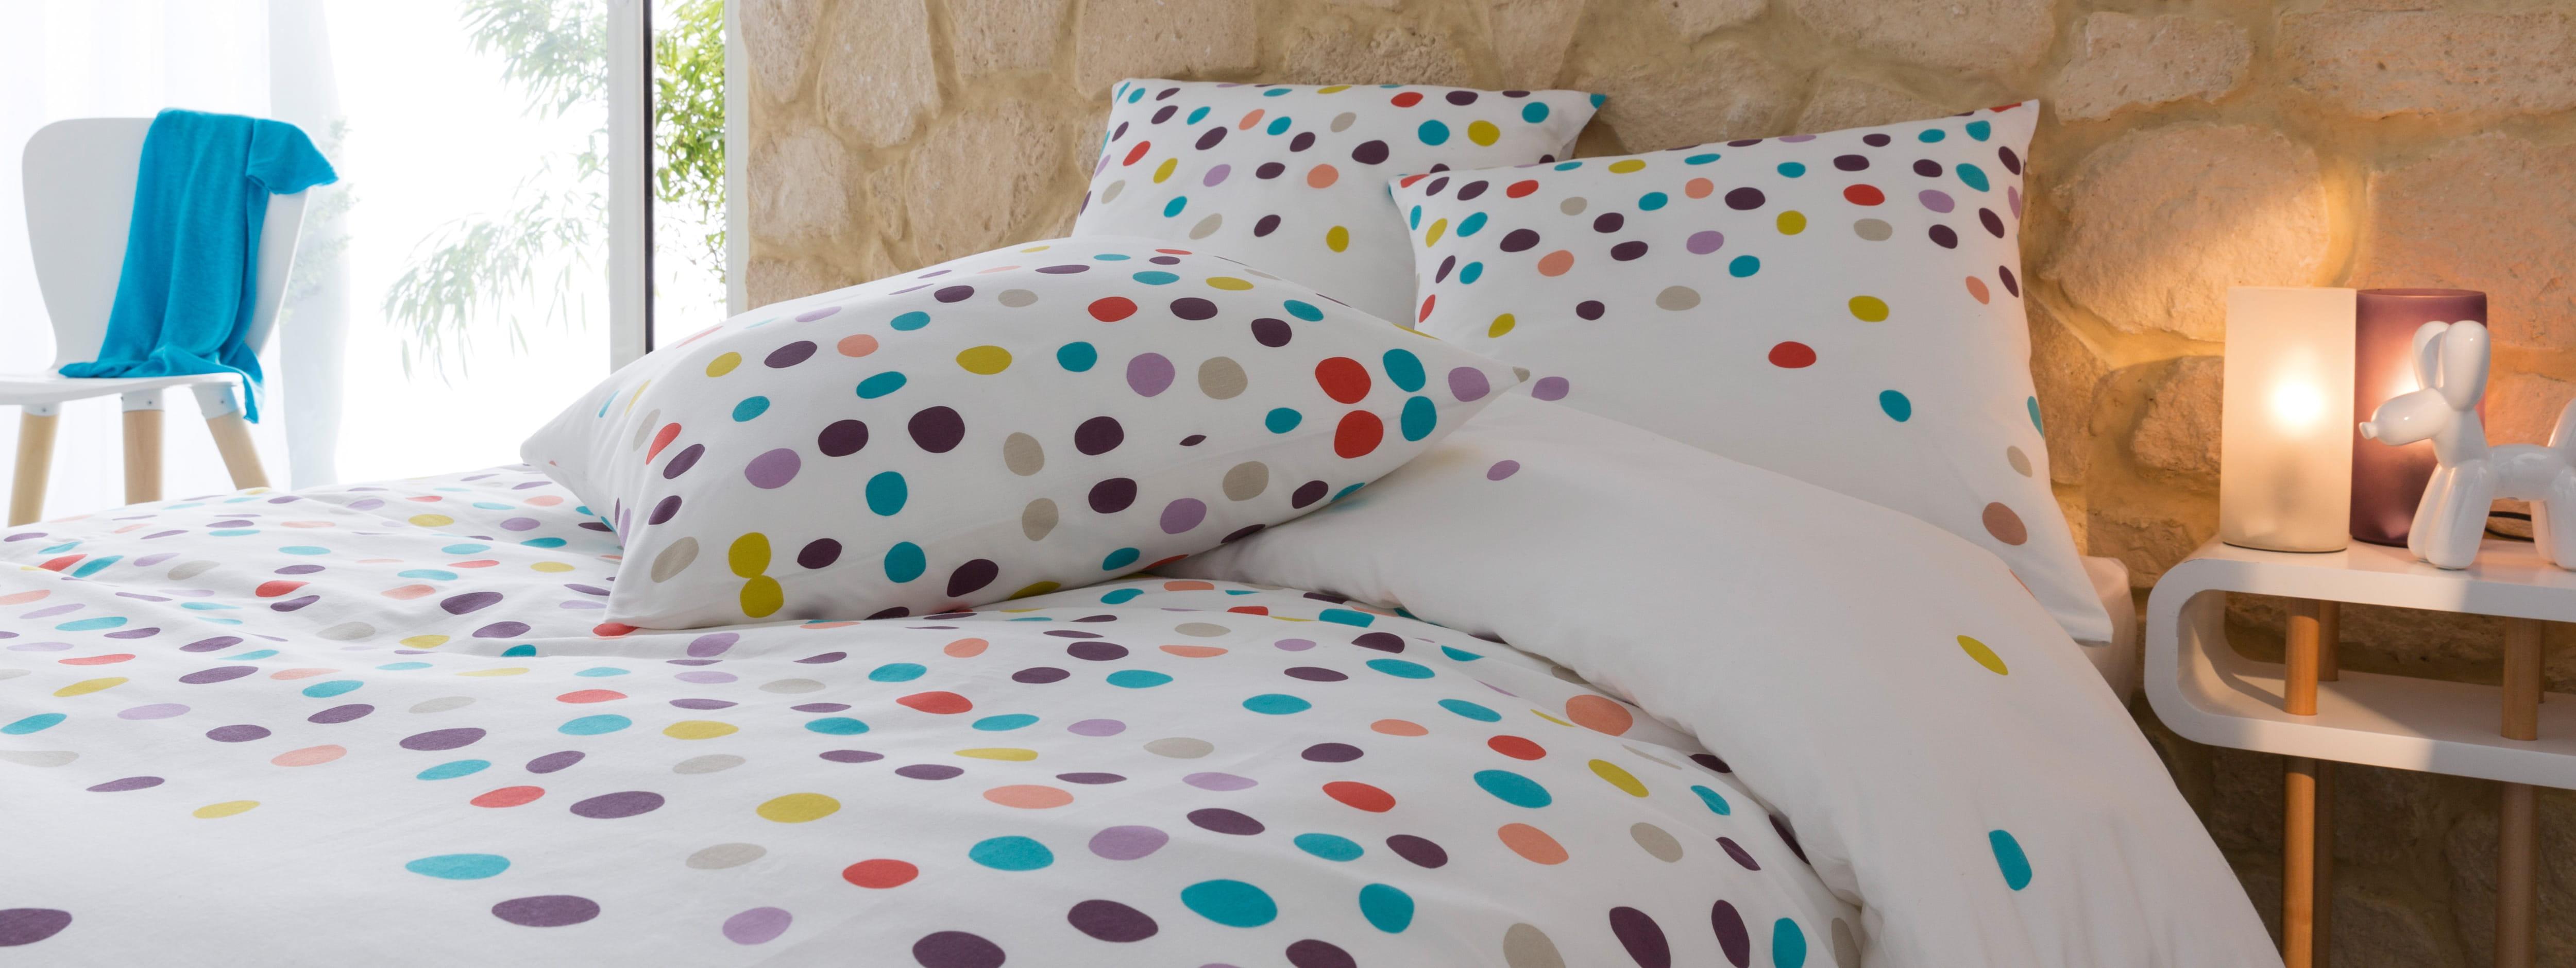 linge de lit confettis de conforama. Black Bedroom Furniture Sets. Home Design Ideas